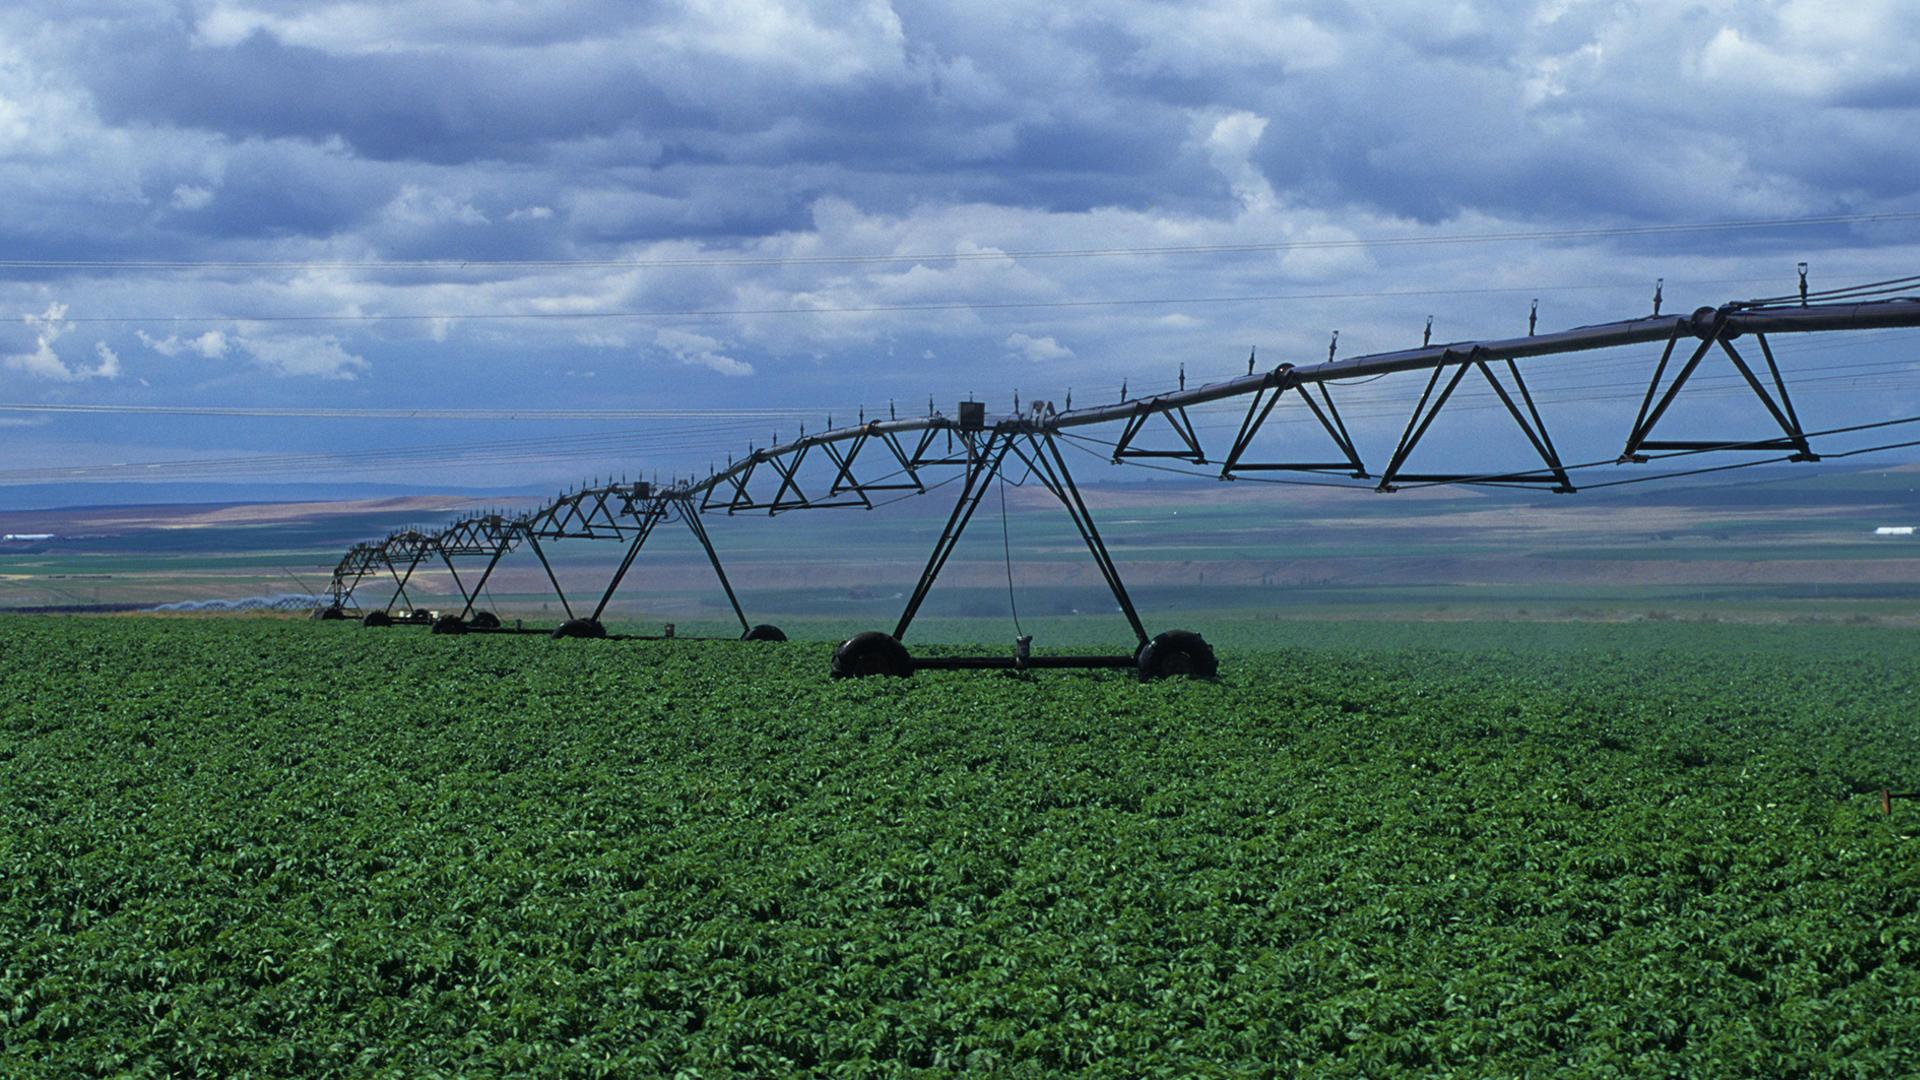 Crop field image